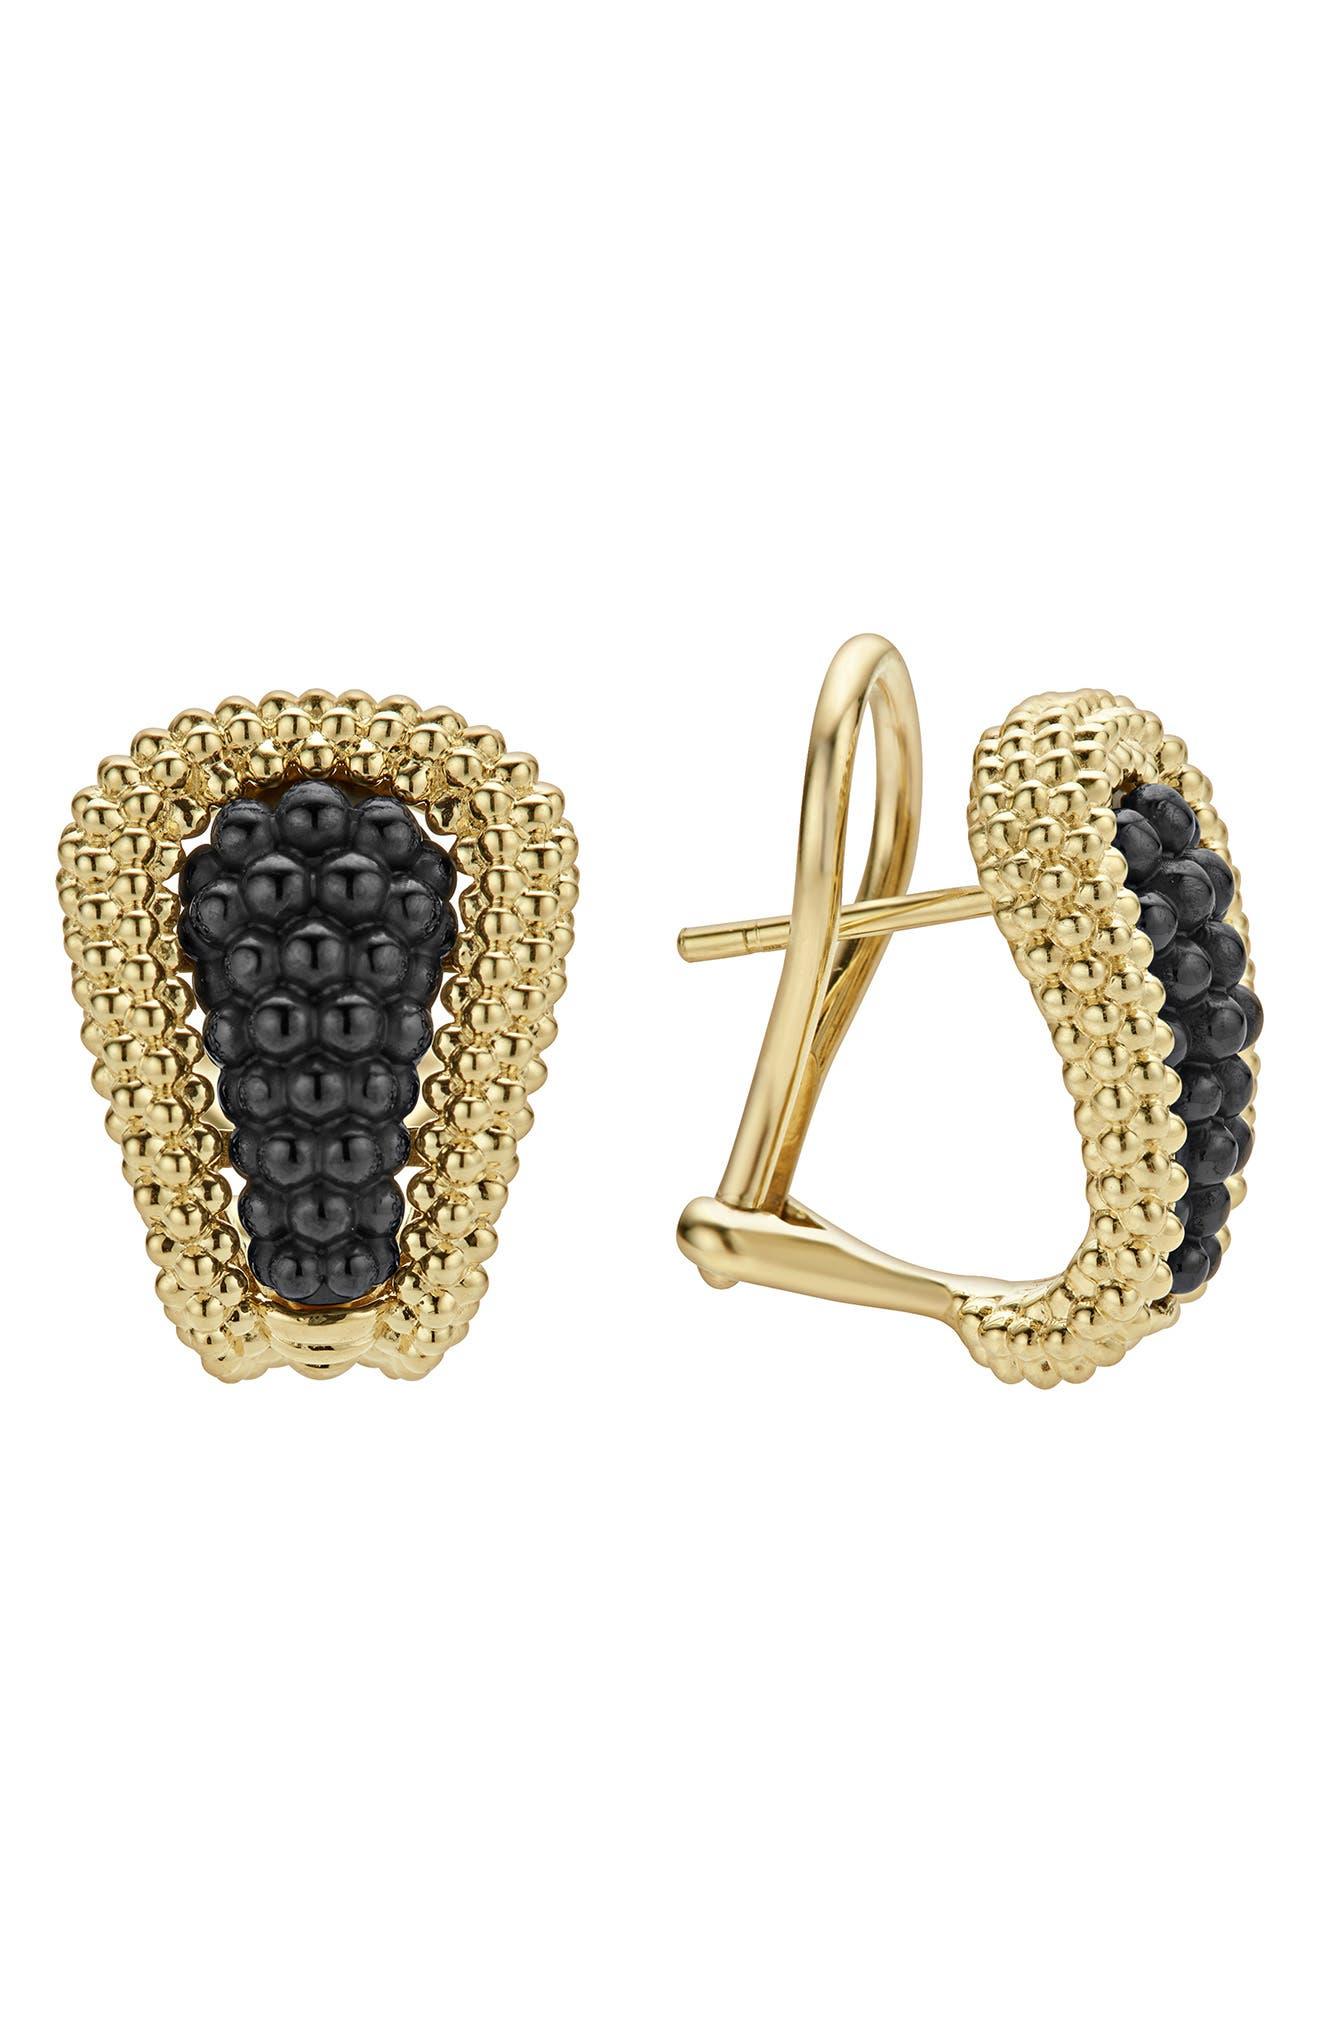 Gold & Black Caviar Tapered Omega Earrings,                             Main thumbnail 1, color,                             GOLD